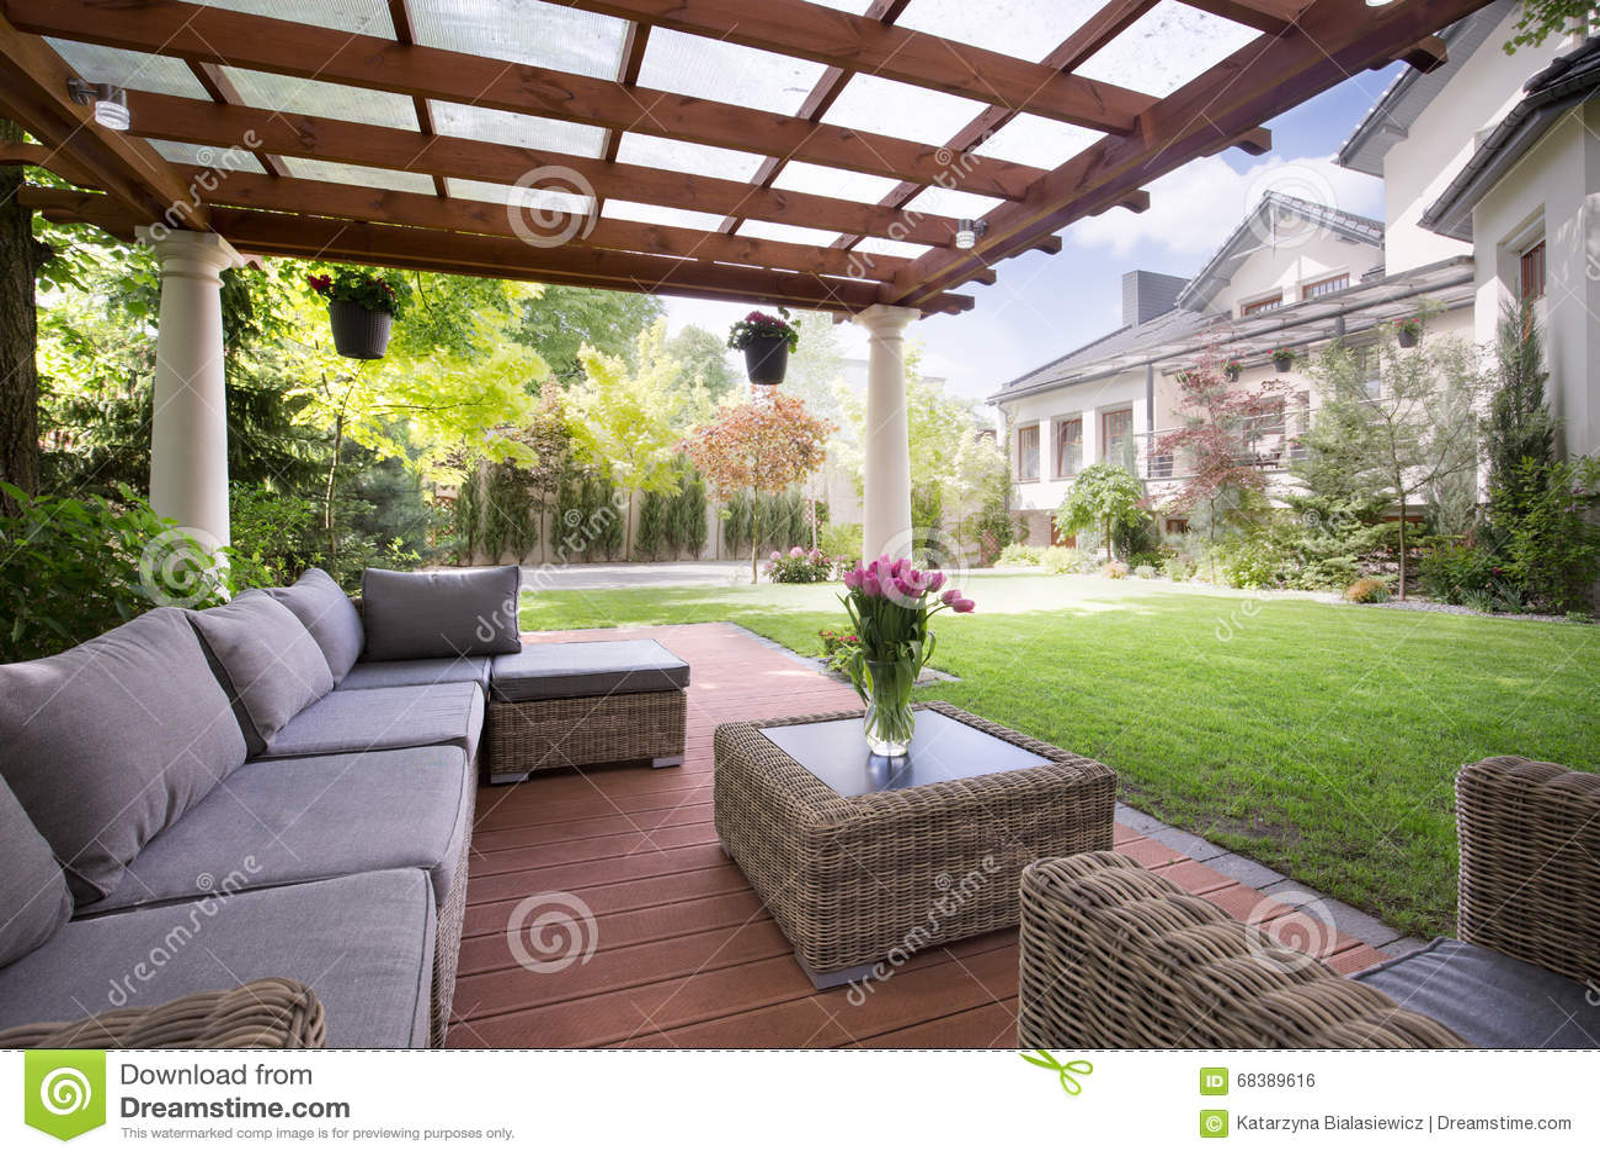 Giardini Moderni Con Sassi : Giardini moderni con sassi interesting aiuole moderne cool latest